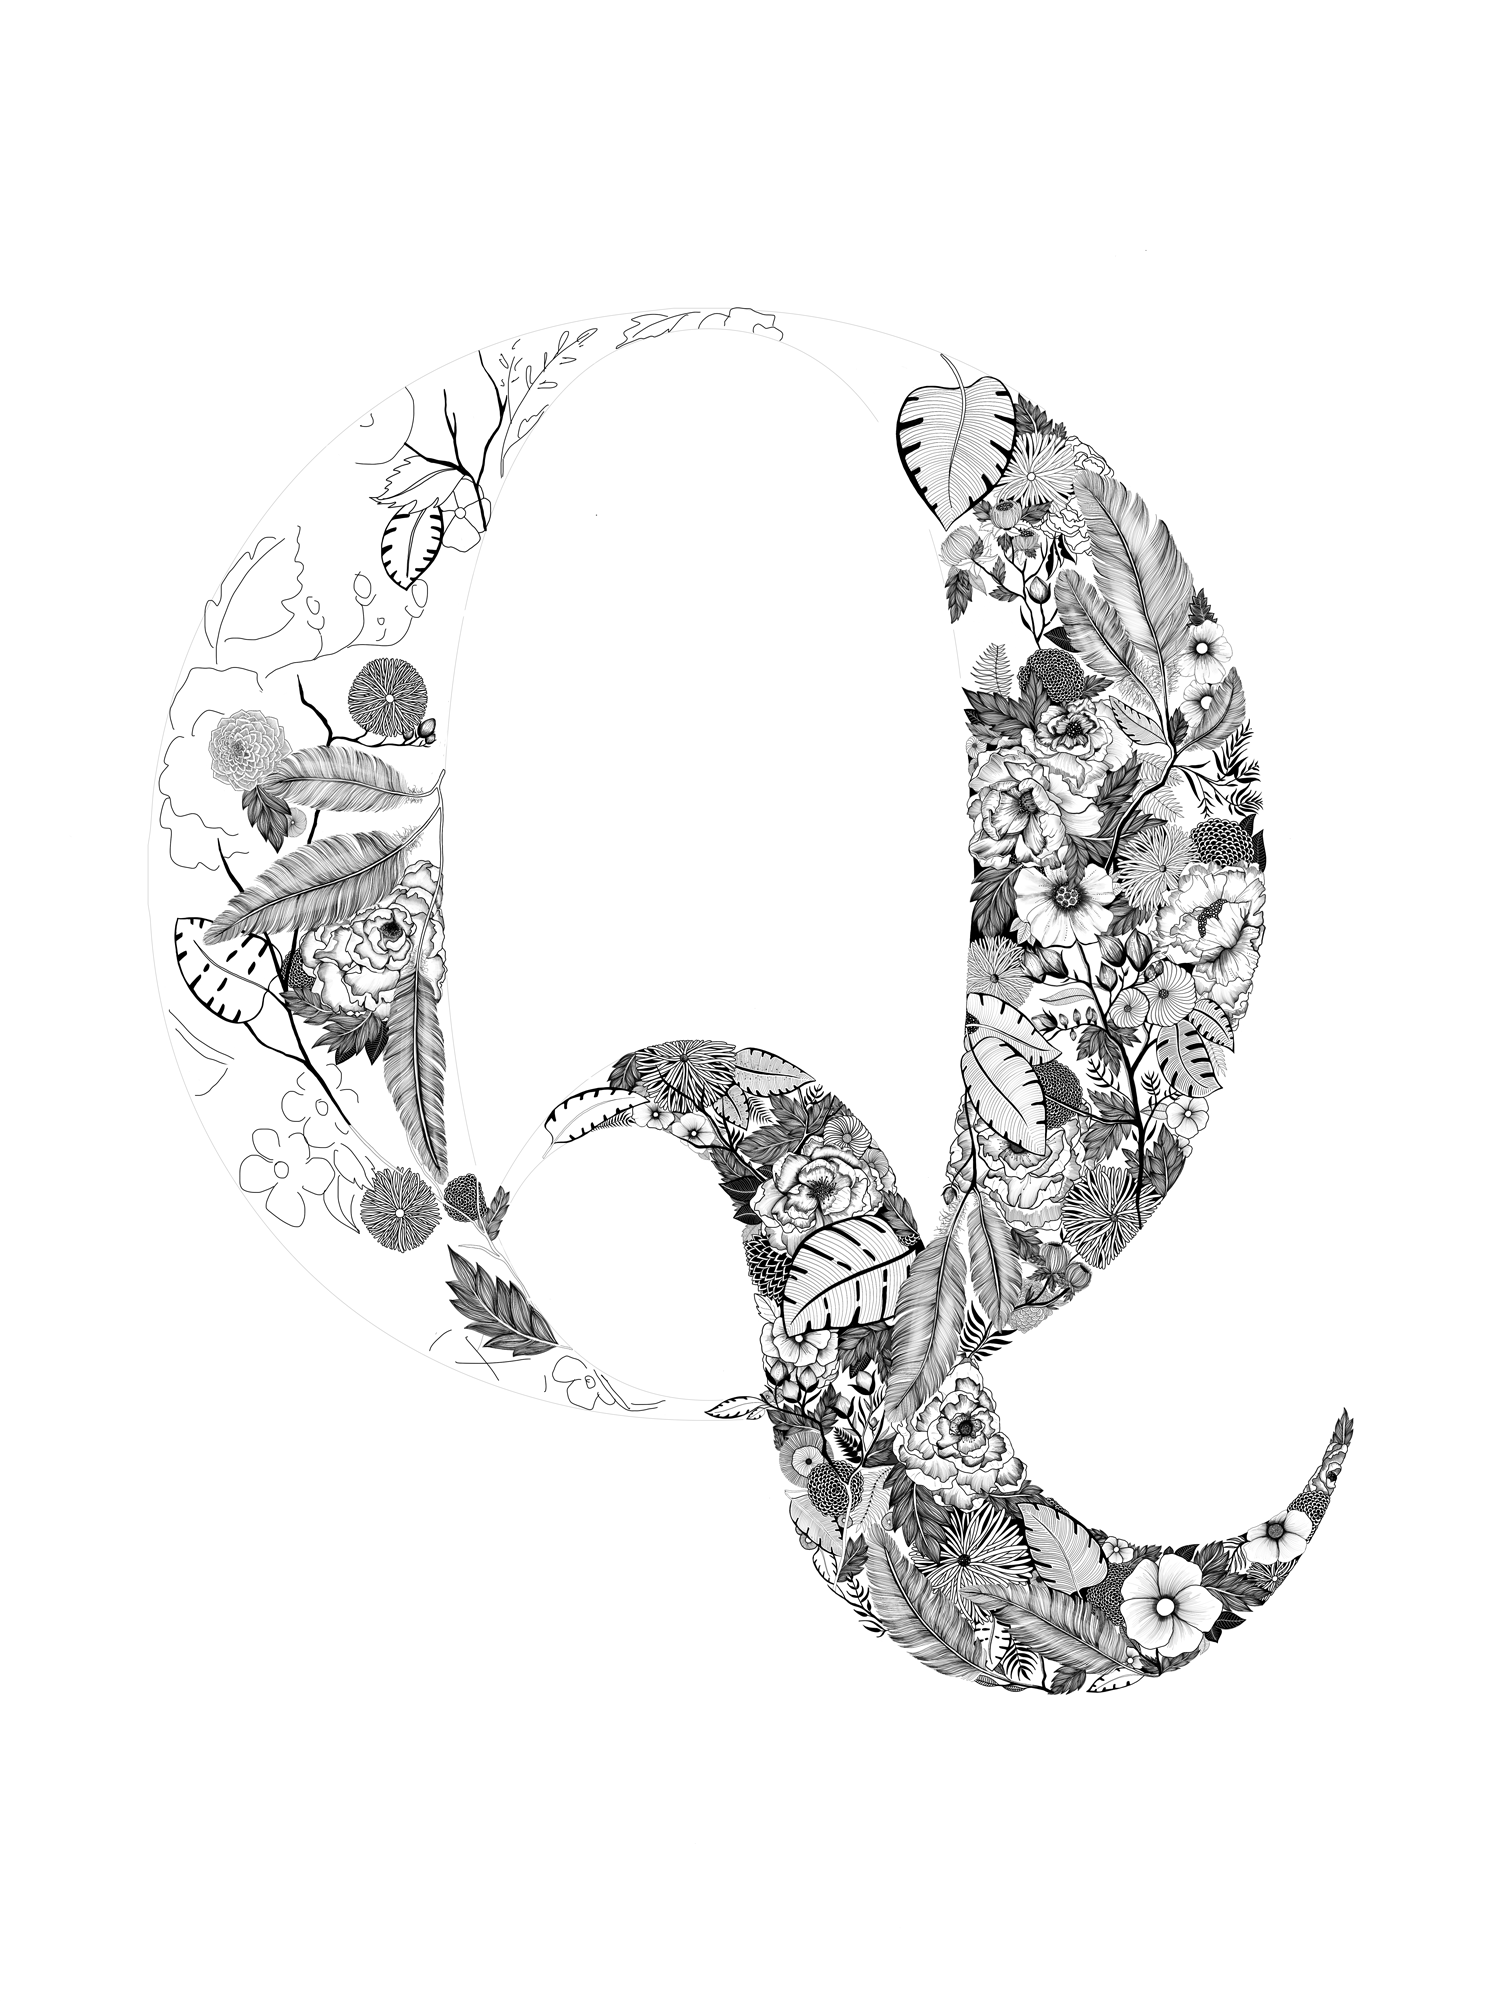 In progress artwork